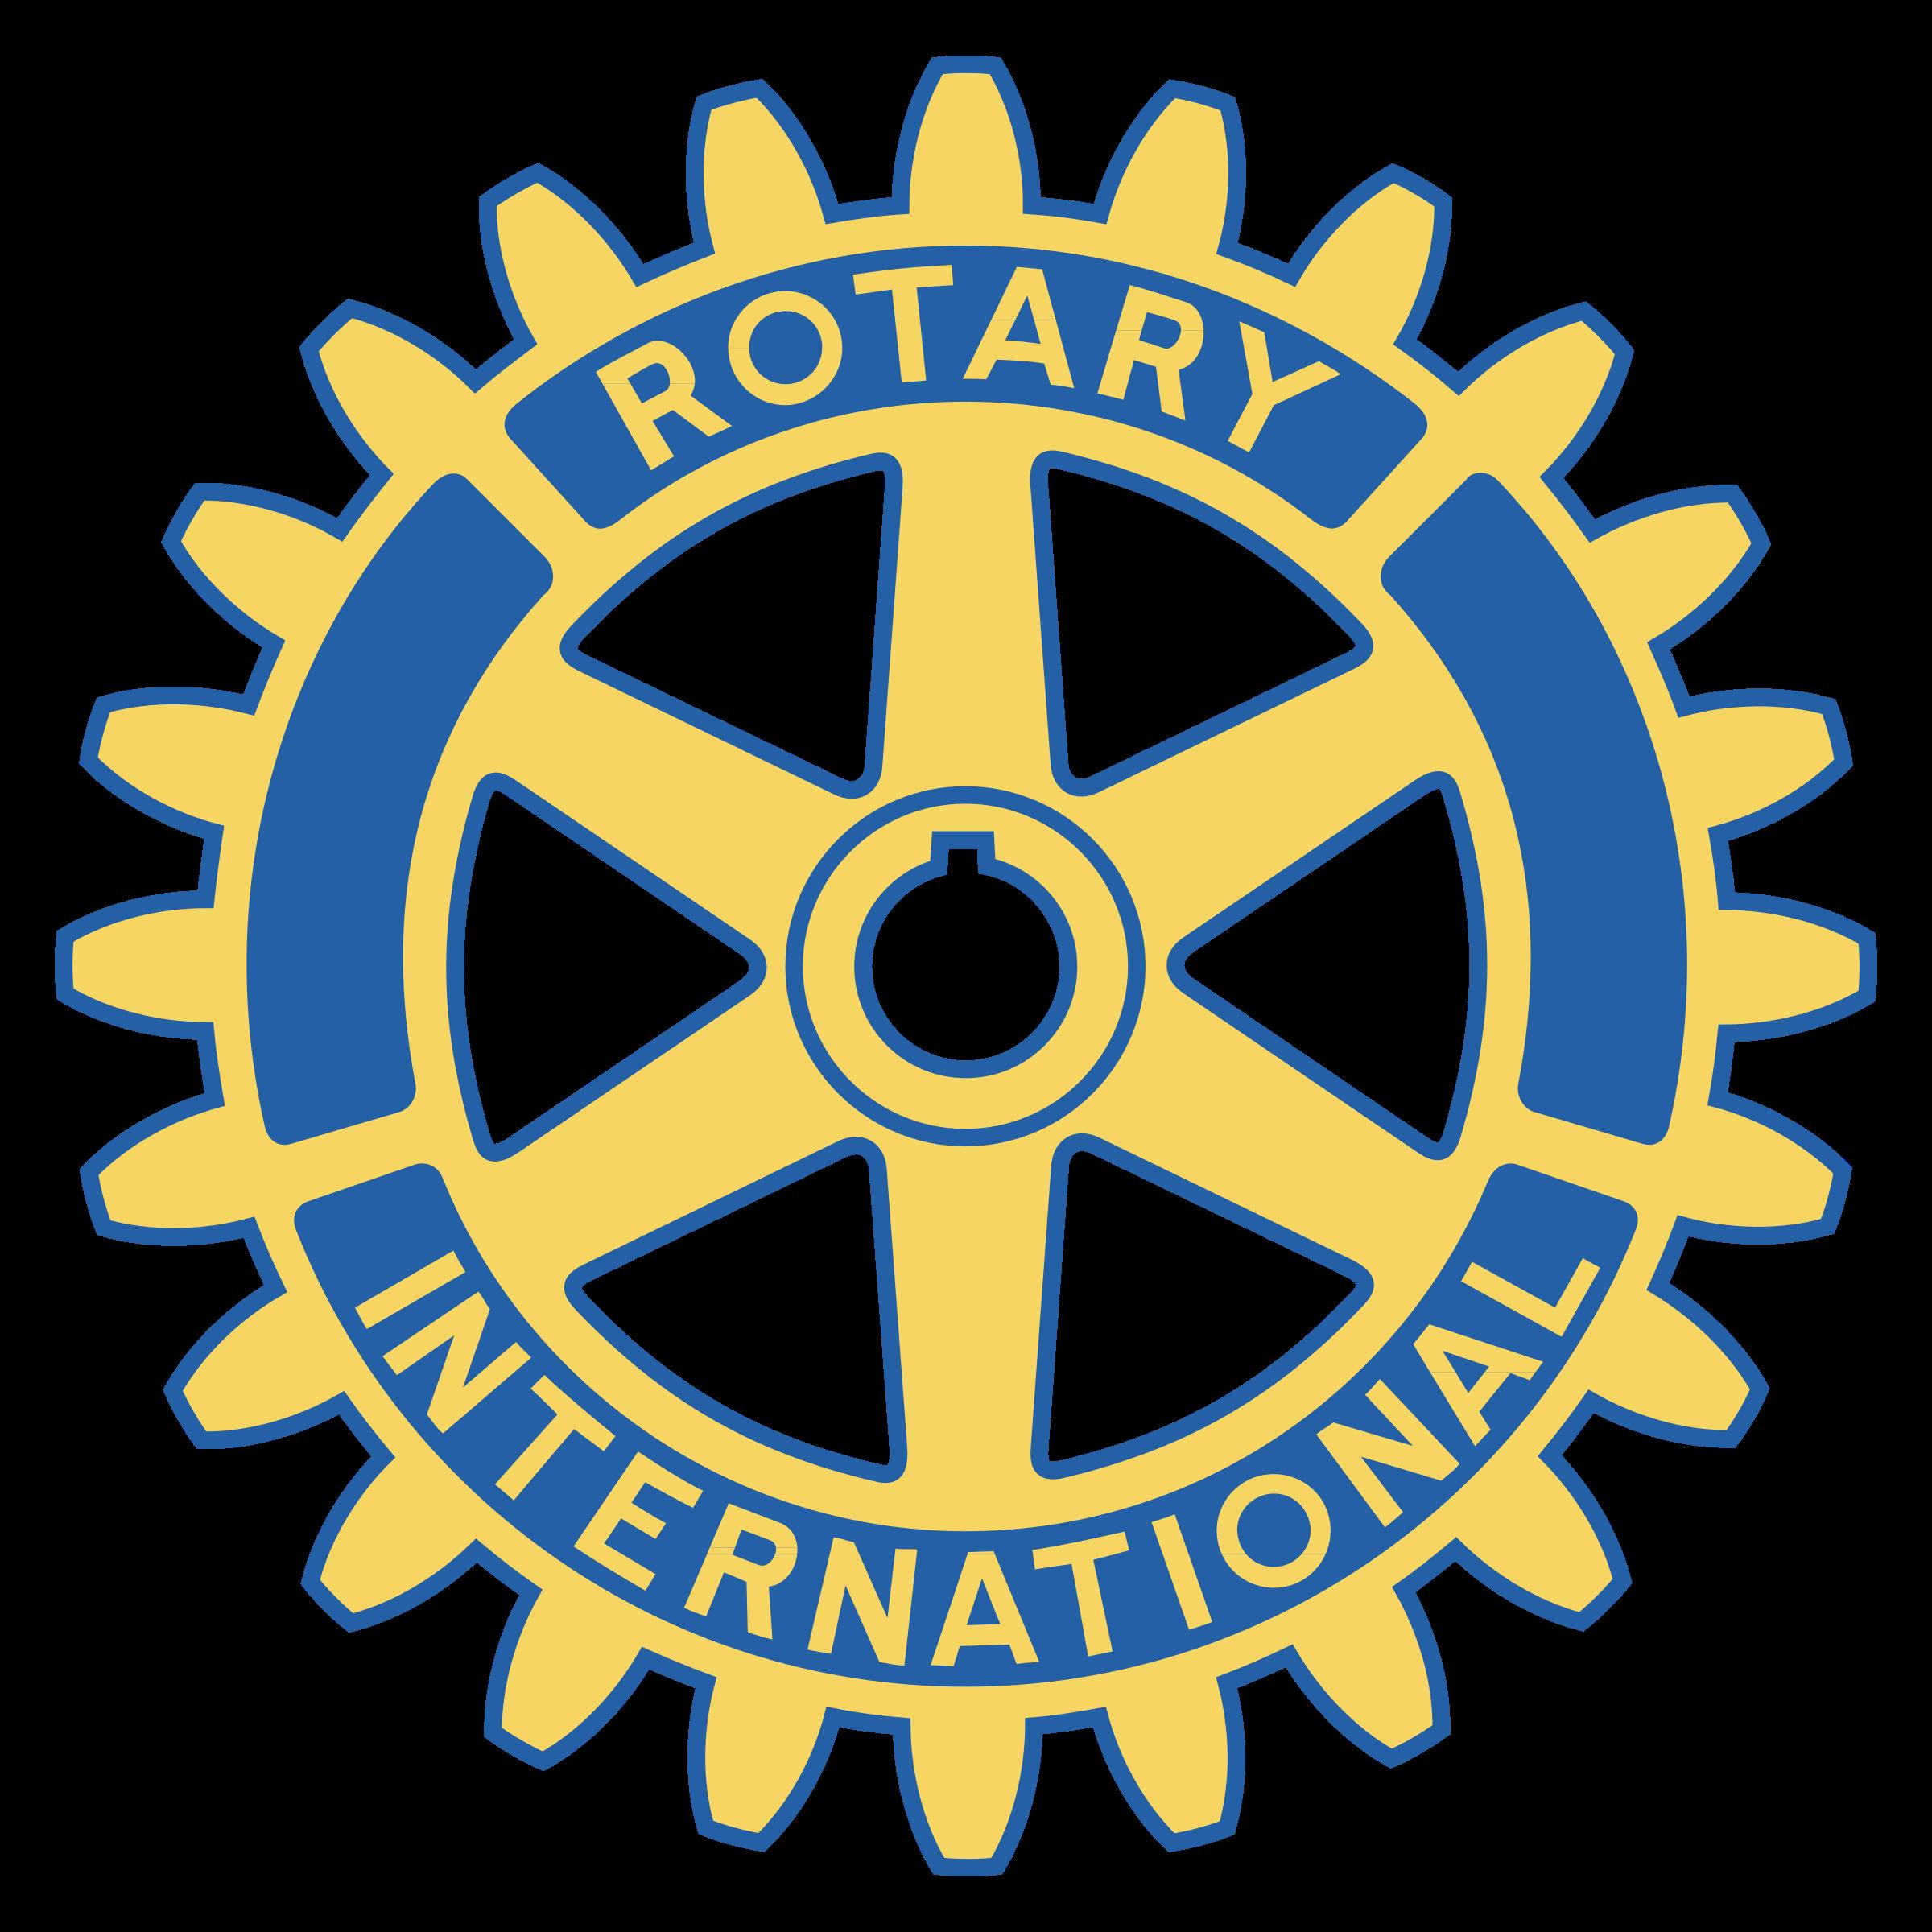 rotary-international-6-logo-png-transparent